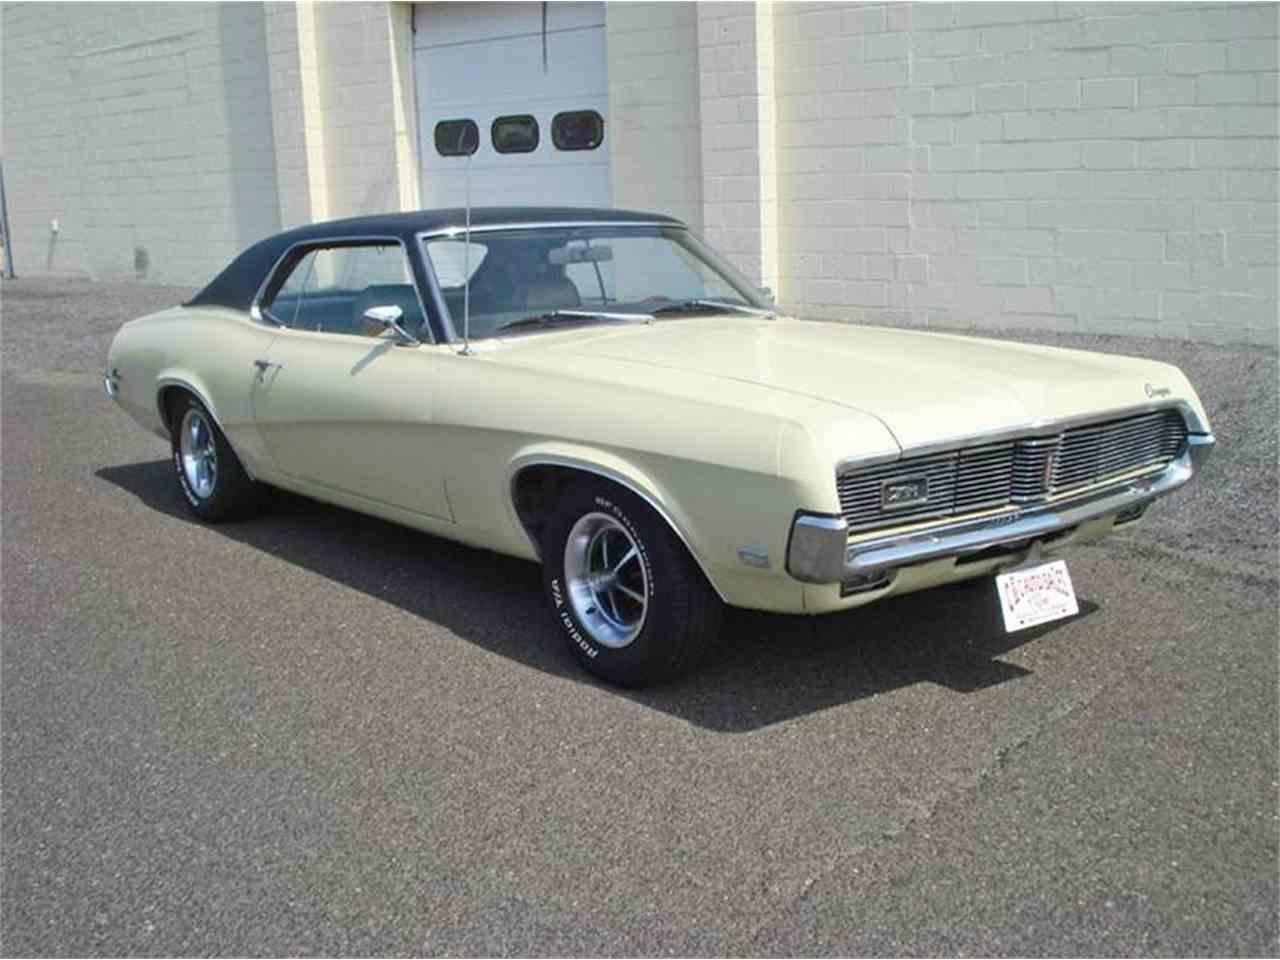 1969 Mercury Cougar for Sale | ClassicCars.com | CC-975292